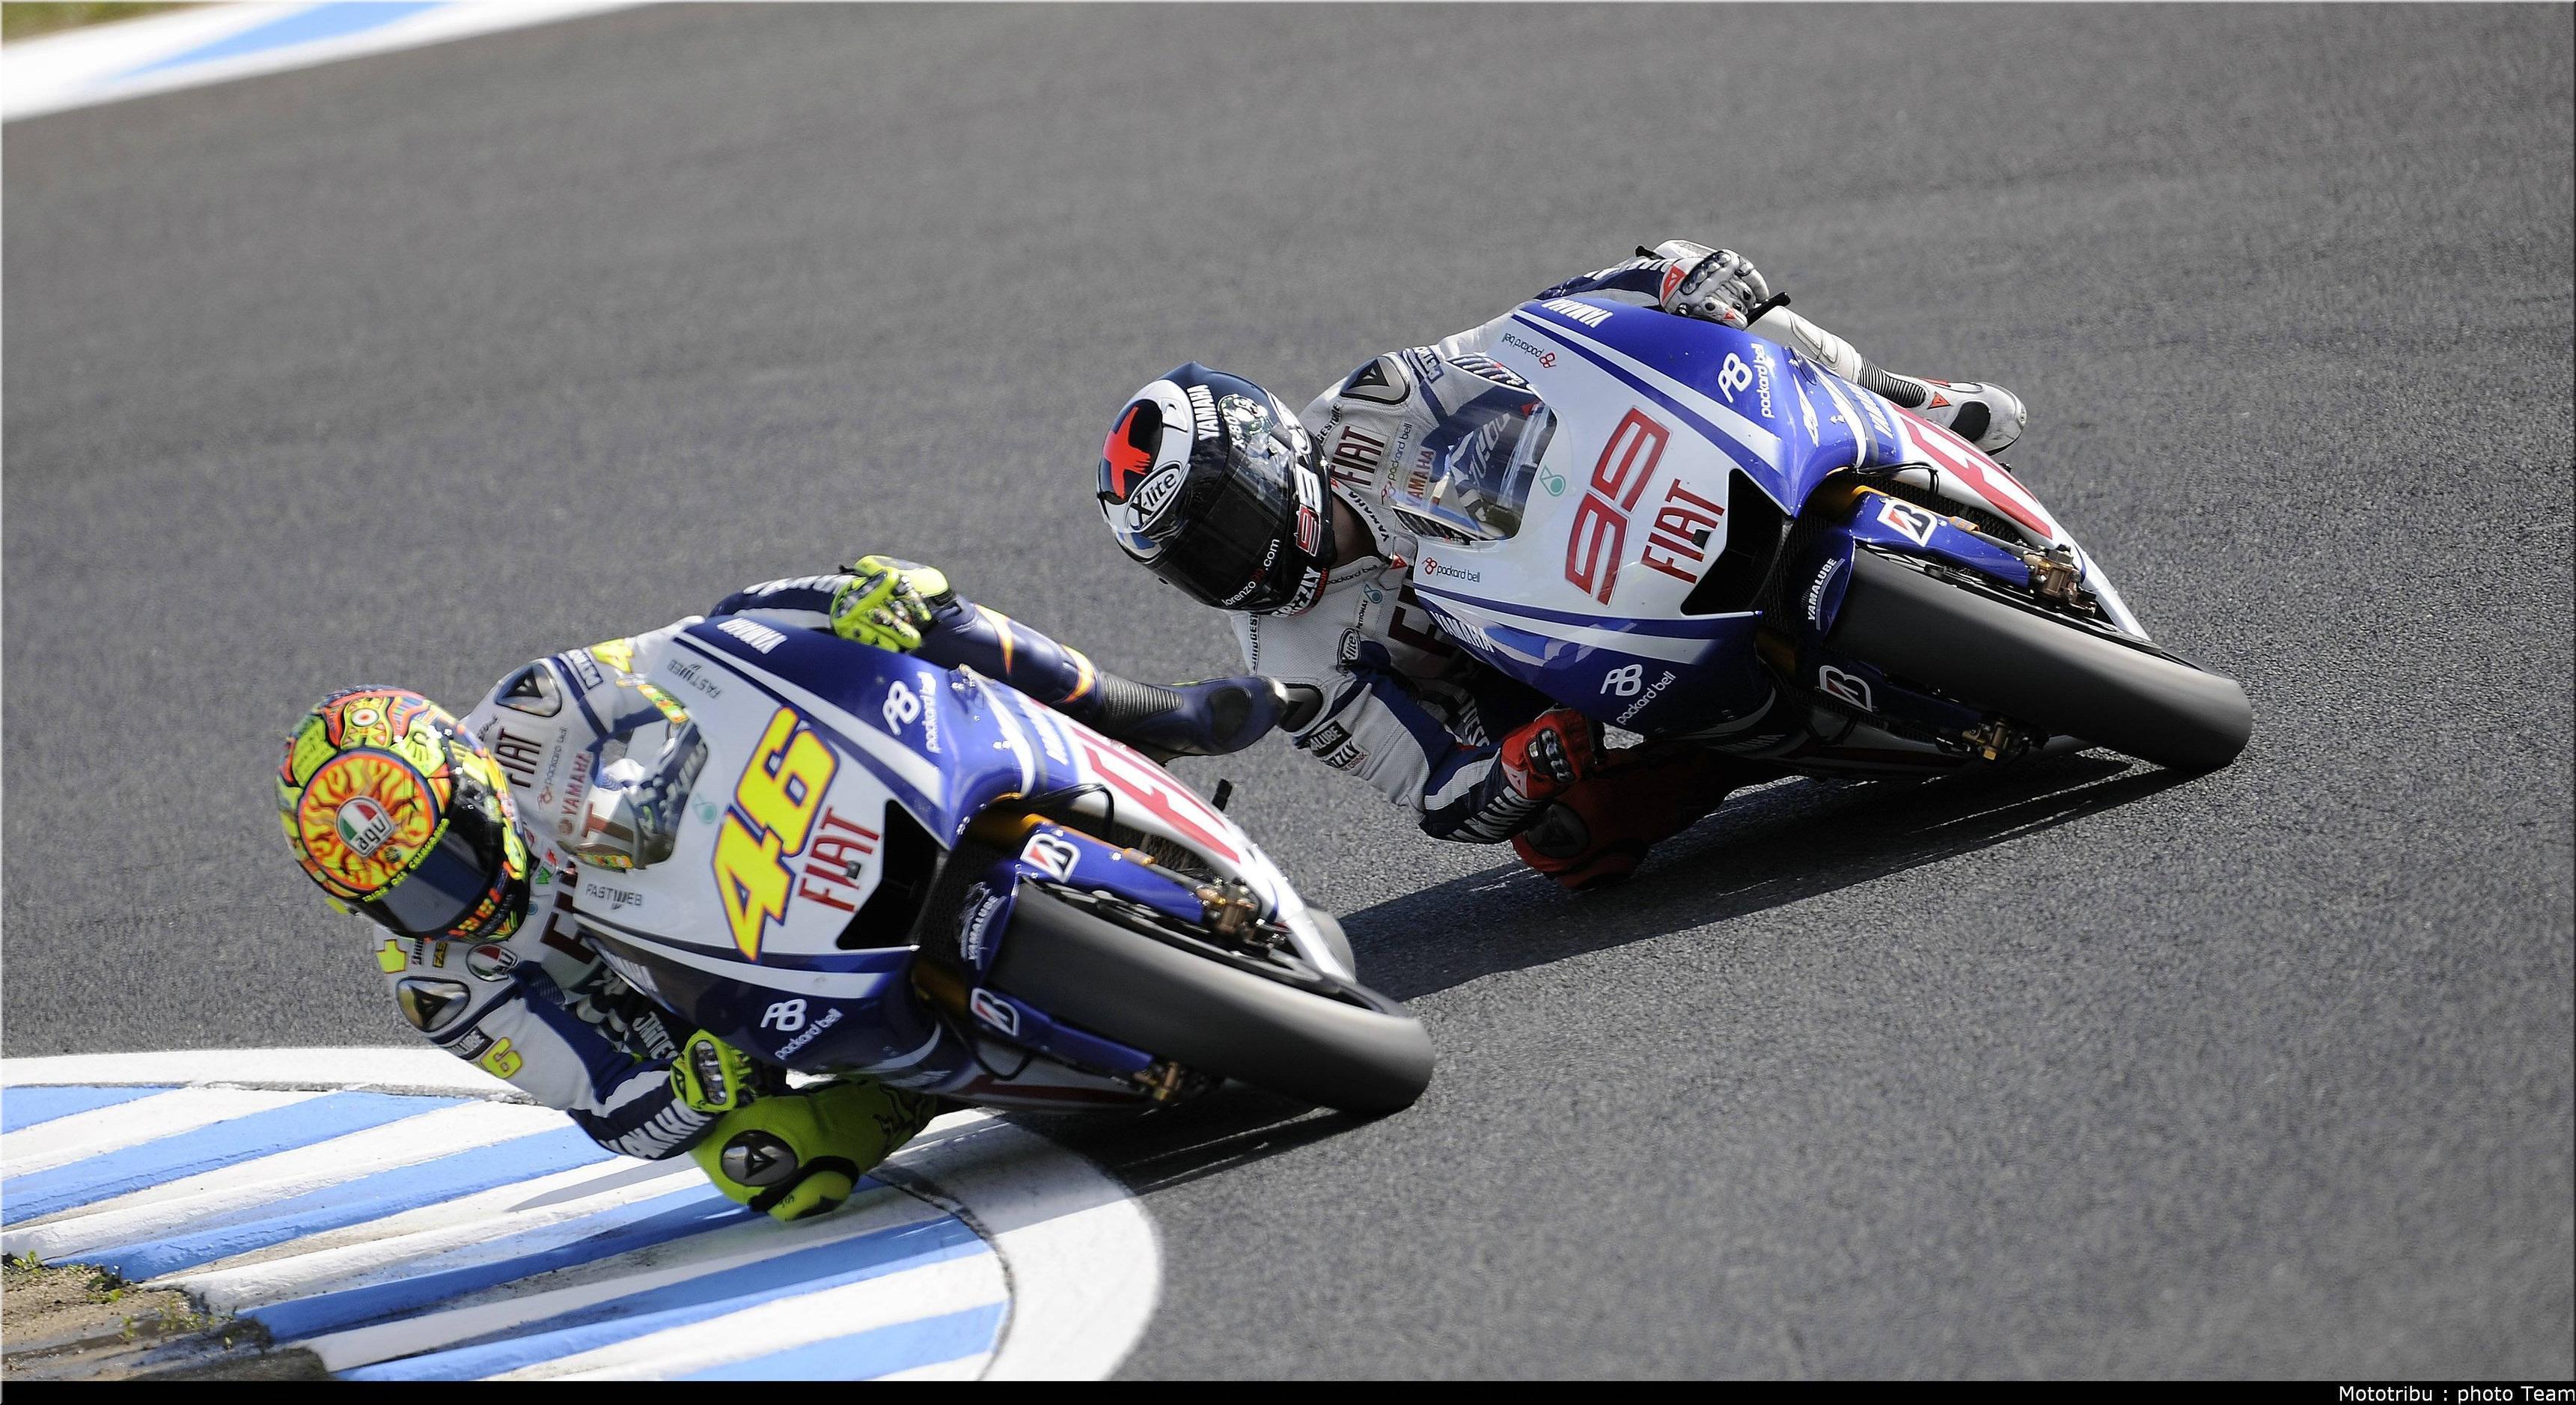 Moto GP Wallpapers 3442x1877